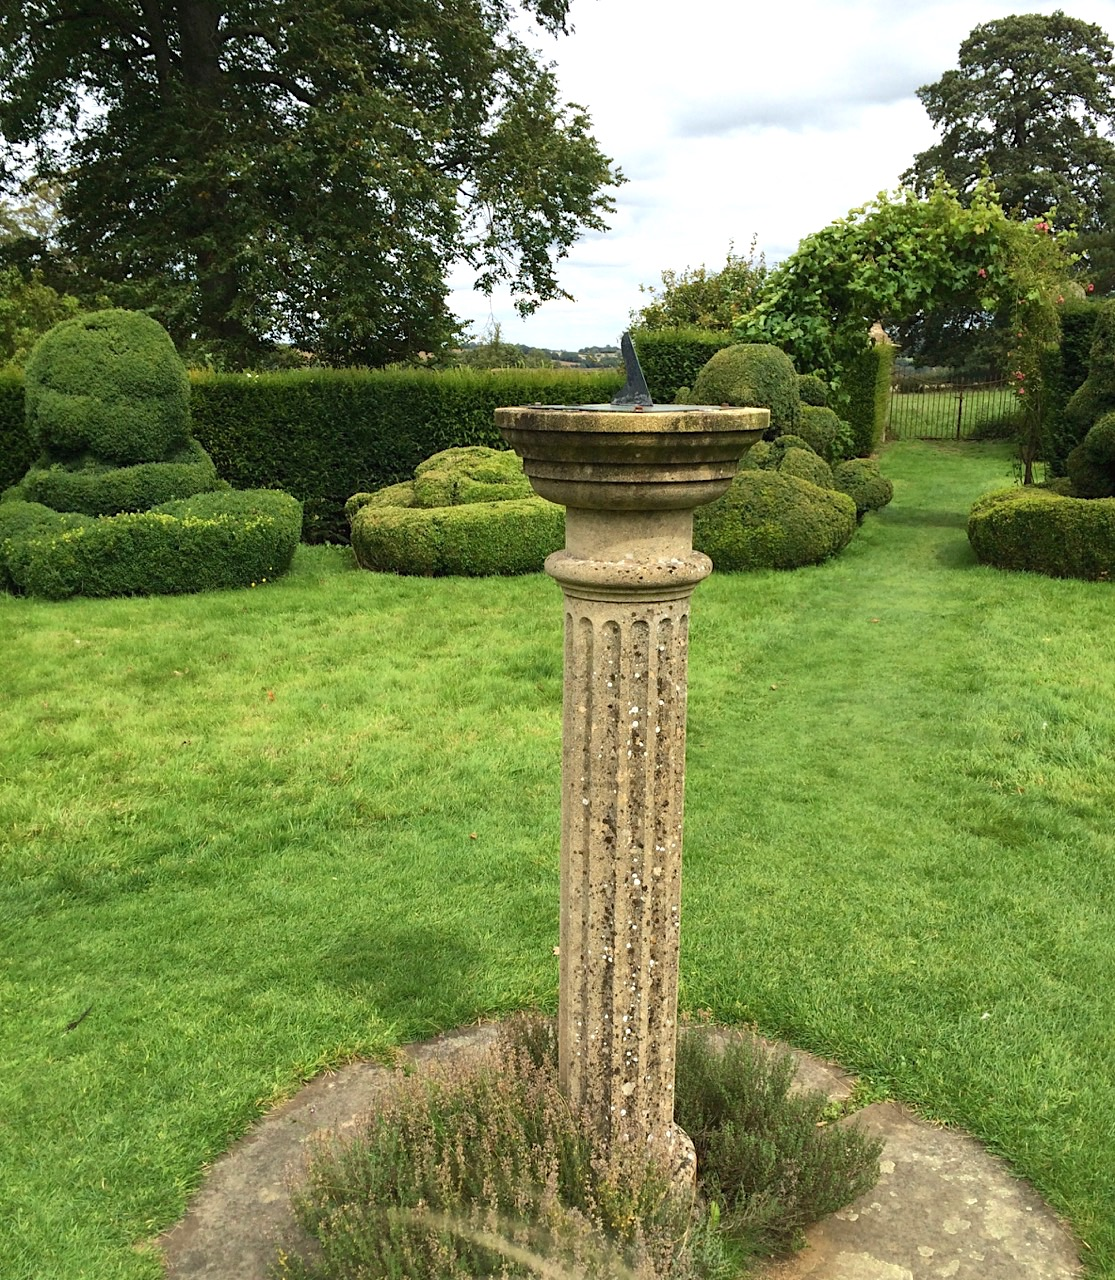 Chastleton House, Oxfordshire: the Sundial